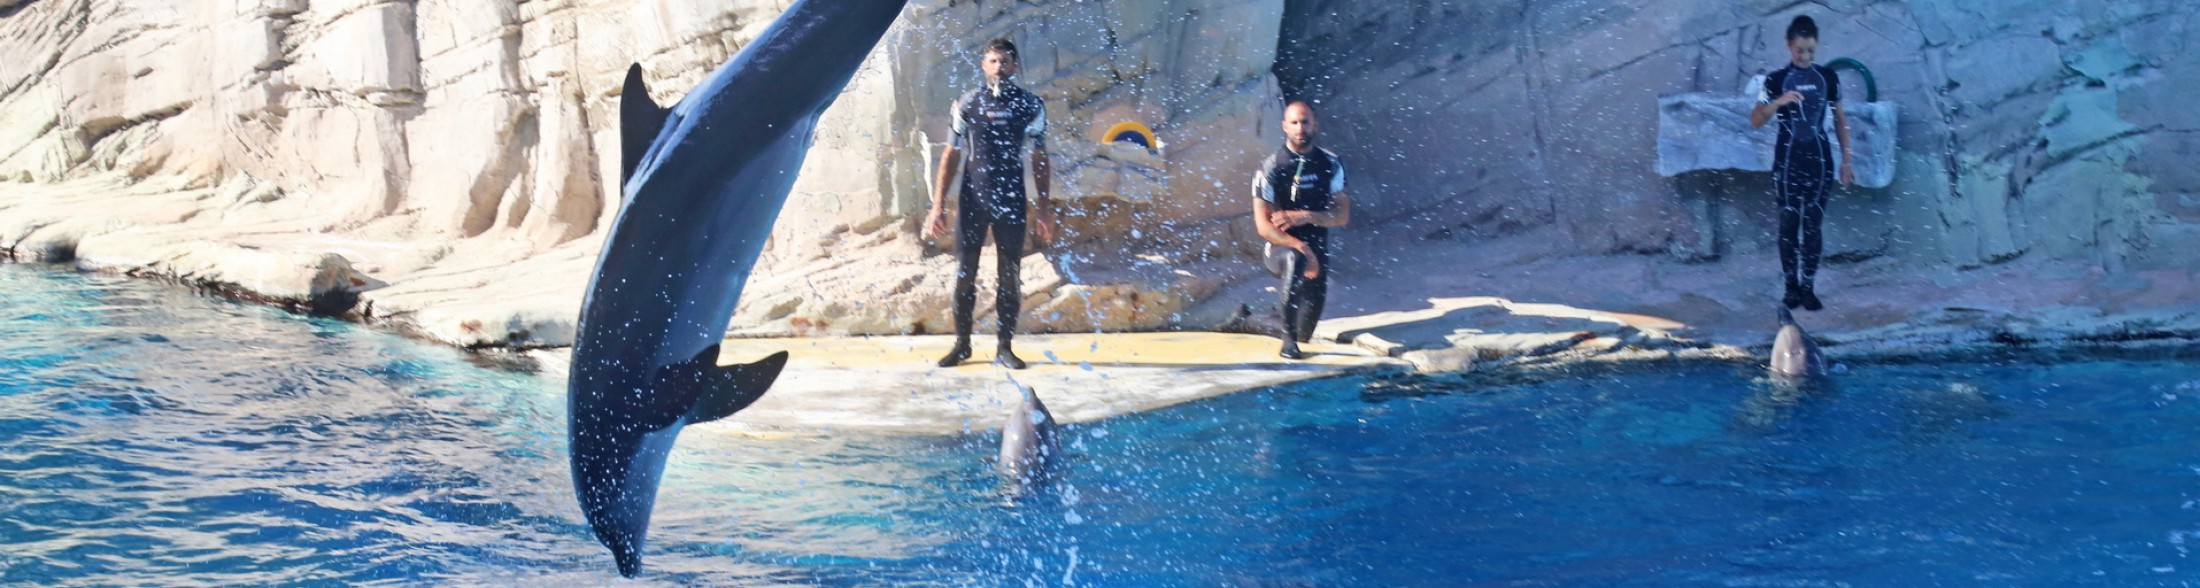 Laguna dei delfini torna aperta a Ottobre